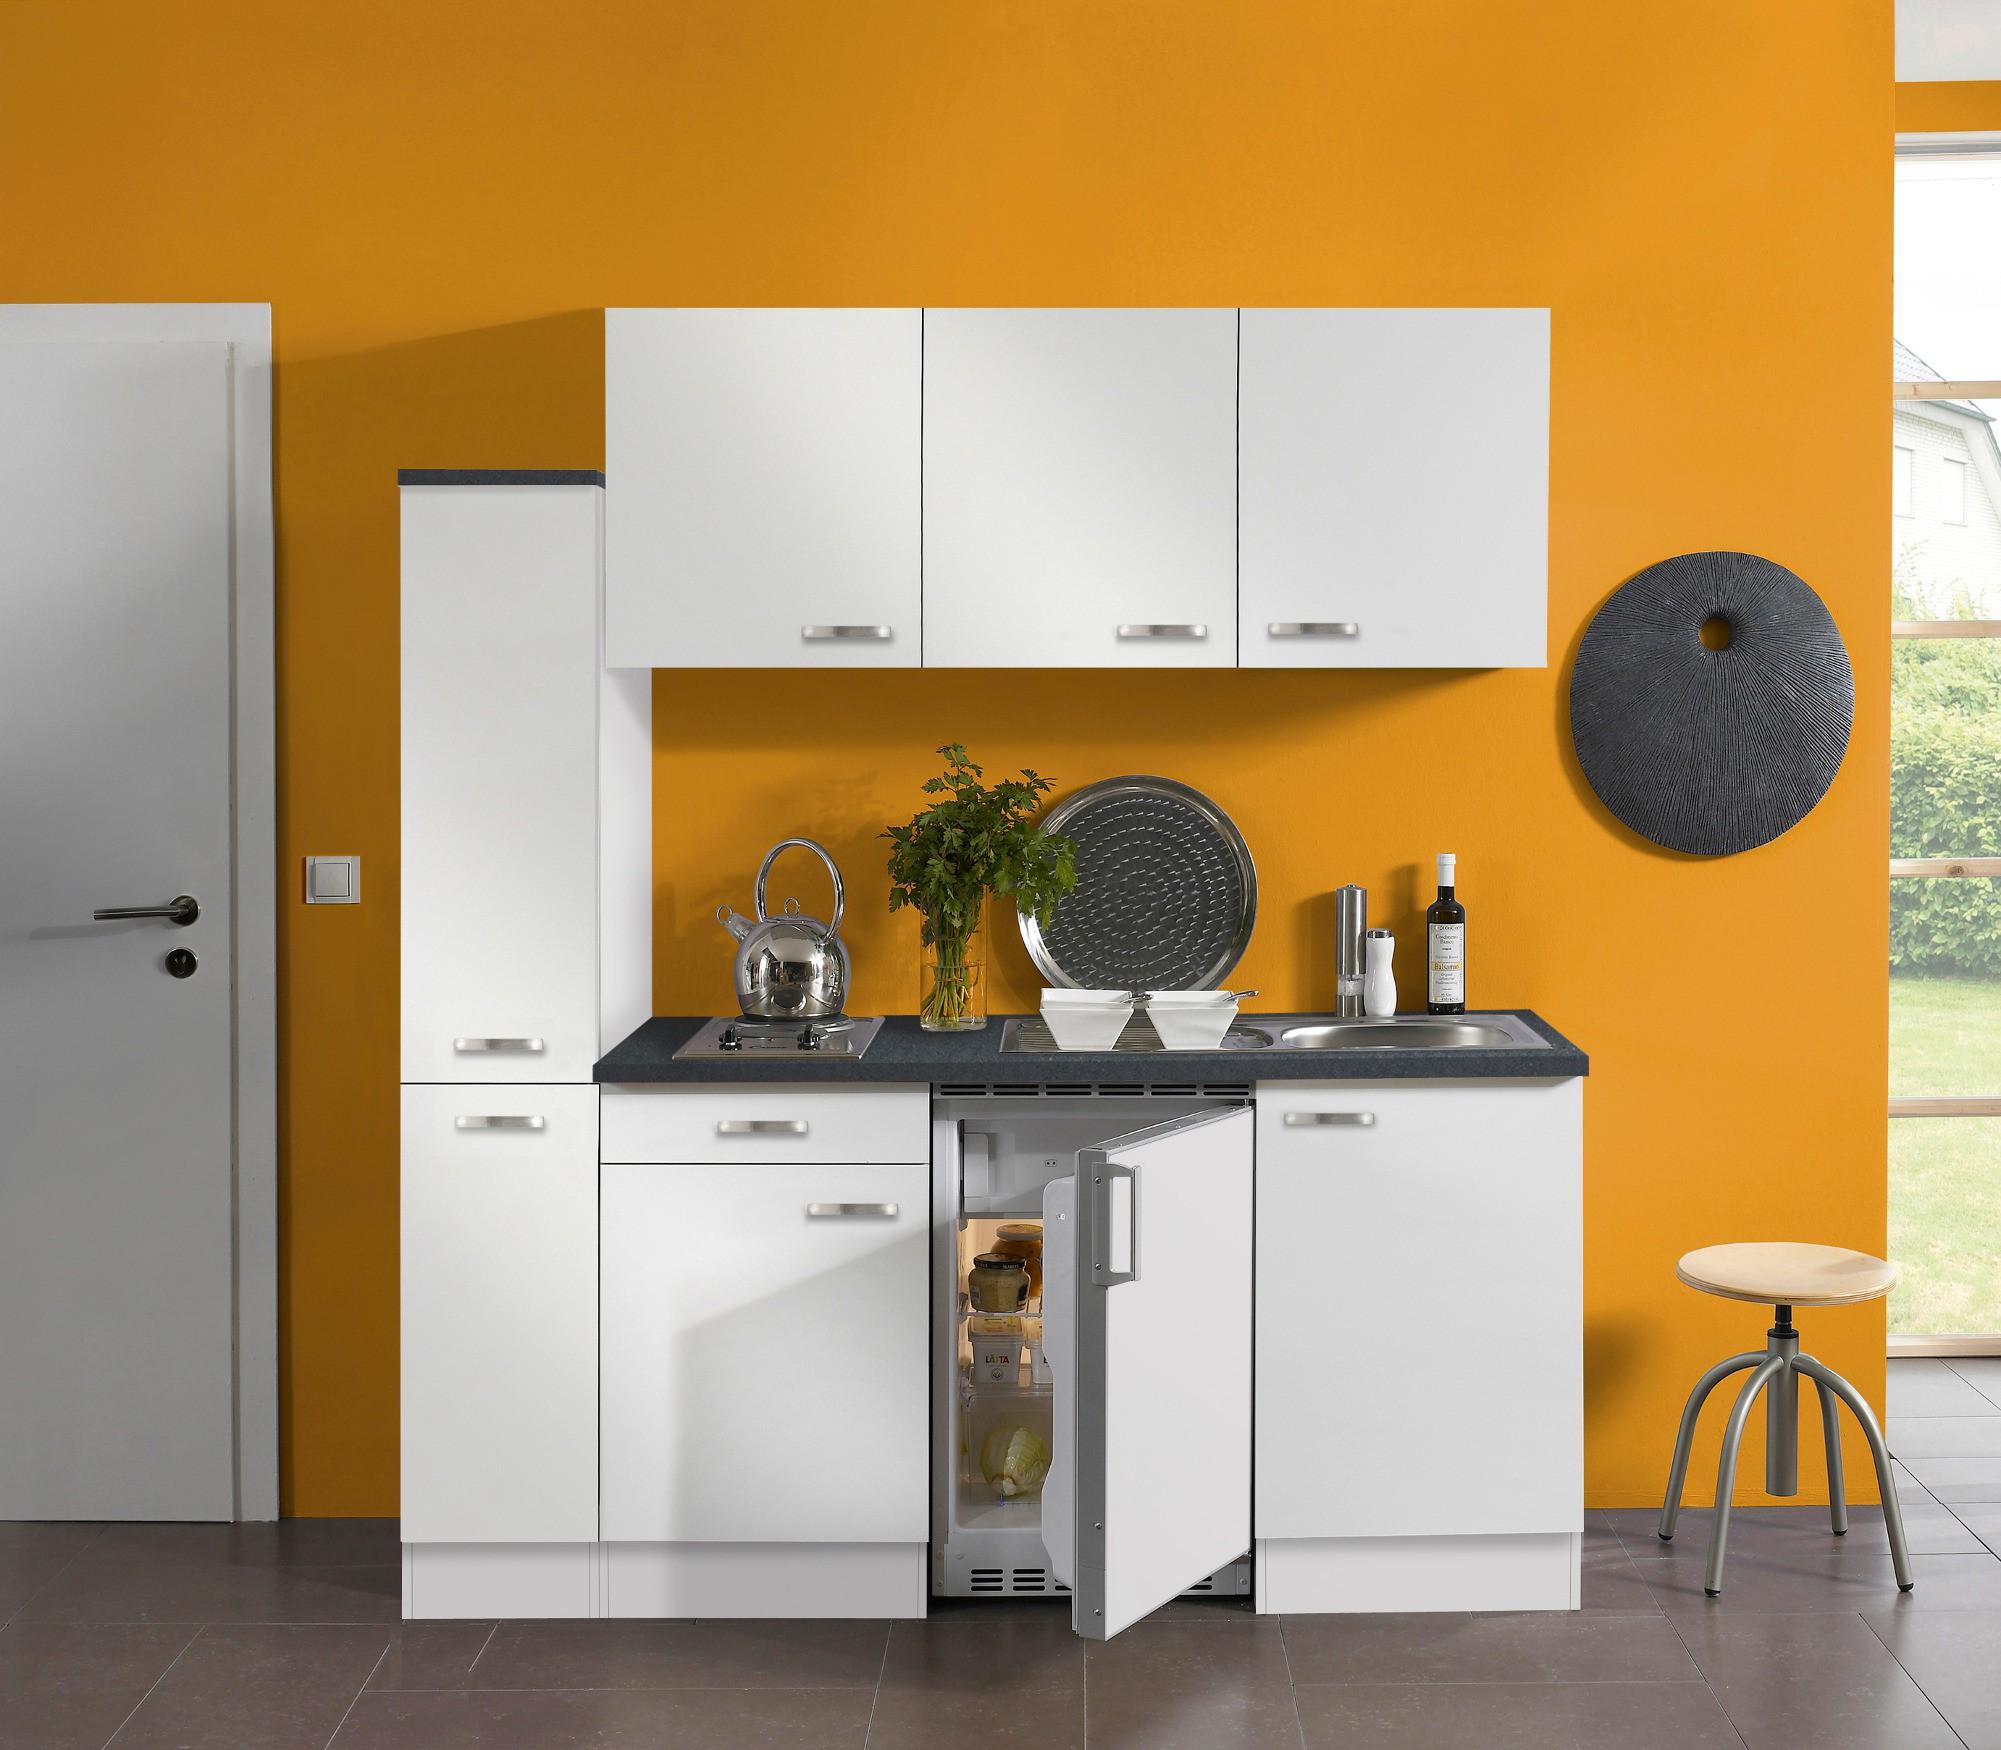 singlek che granada mit elektro kochfeld 9 teilig breite 180 cm wei k che singlek chen. Black Bedroom Furniture Sets. Home Design Ideas